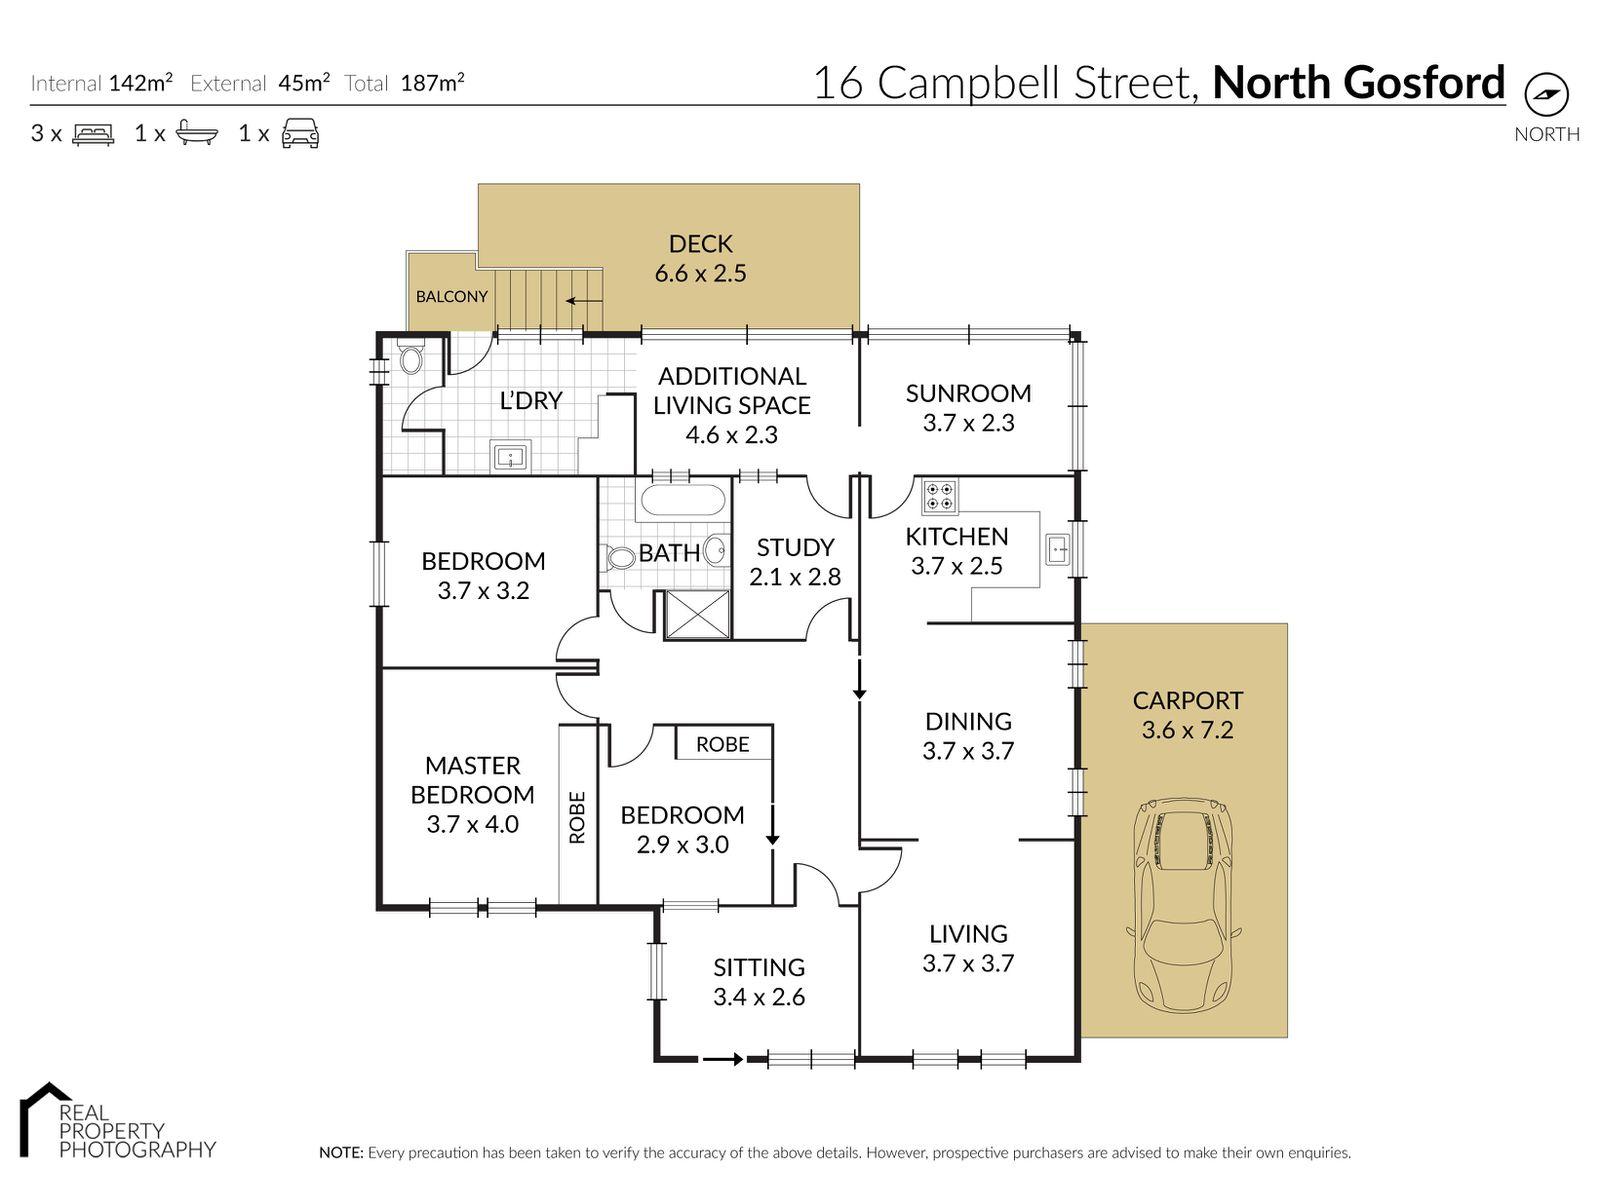 16 Campbell Street, North Gosford